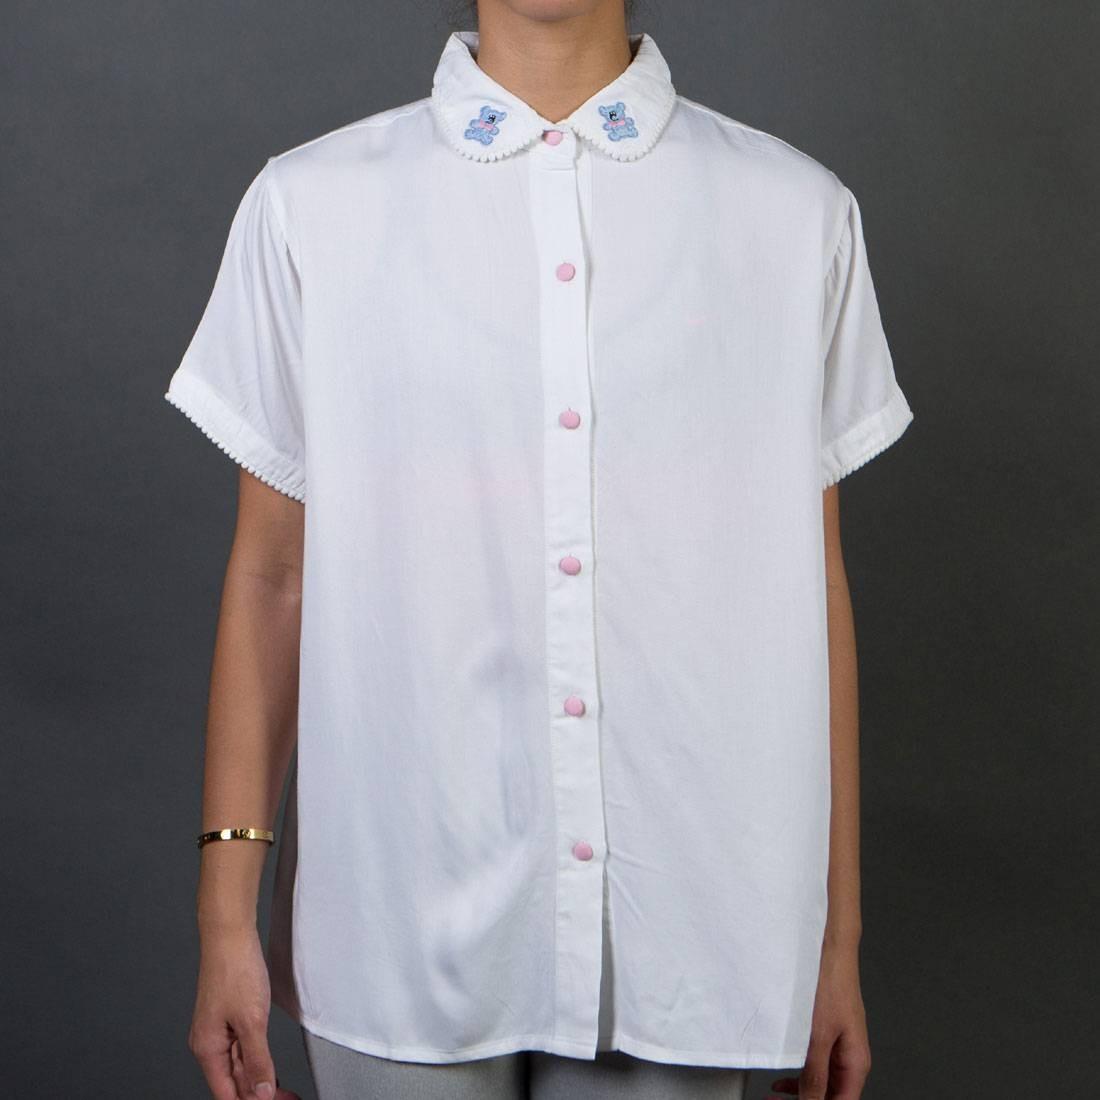 【 LAZY OAF WOMEN POM BEAR SHIRT WHITE 】 メンズファッション トップス カジュアルシャツ 送料無料